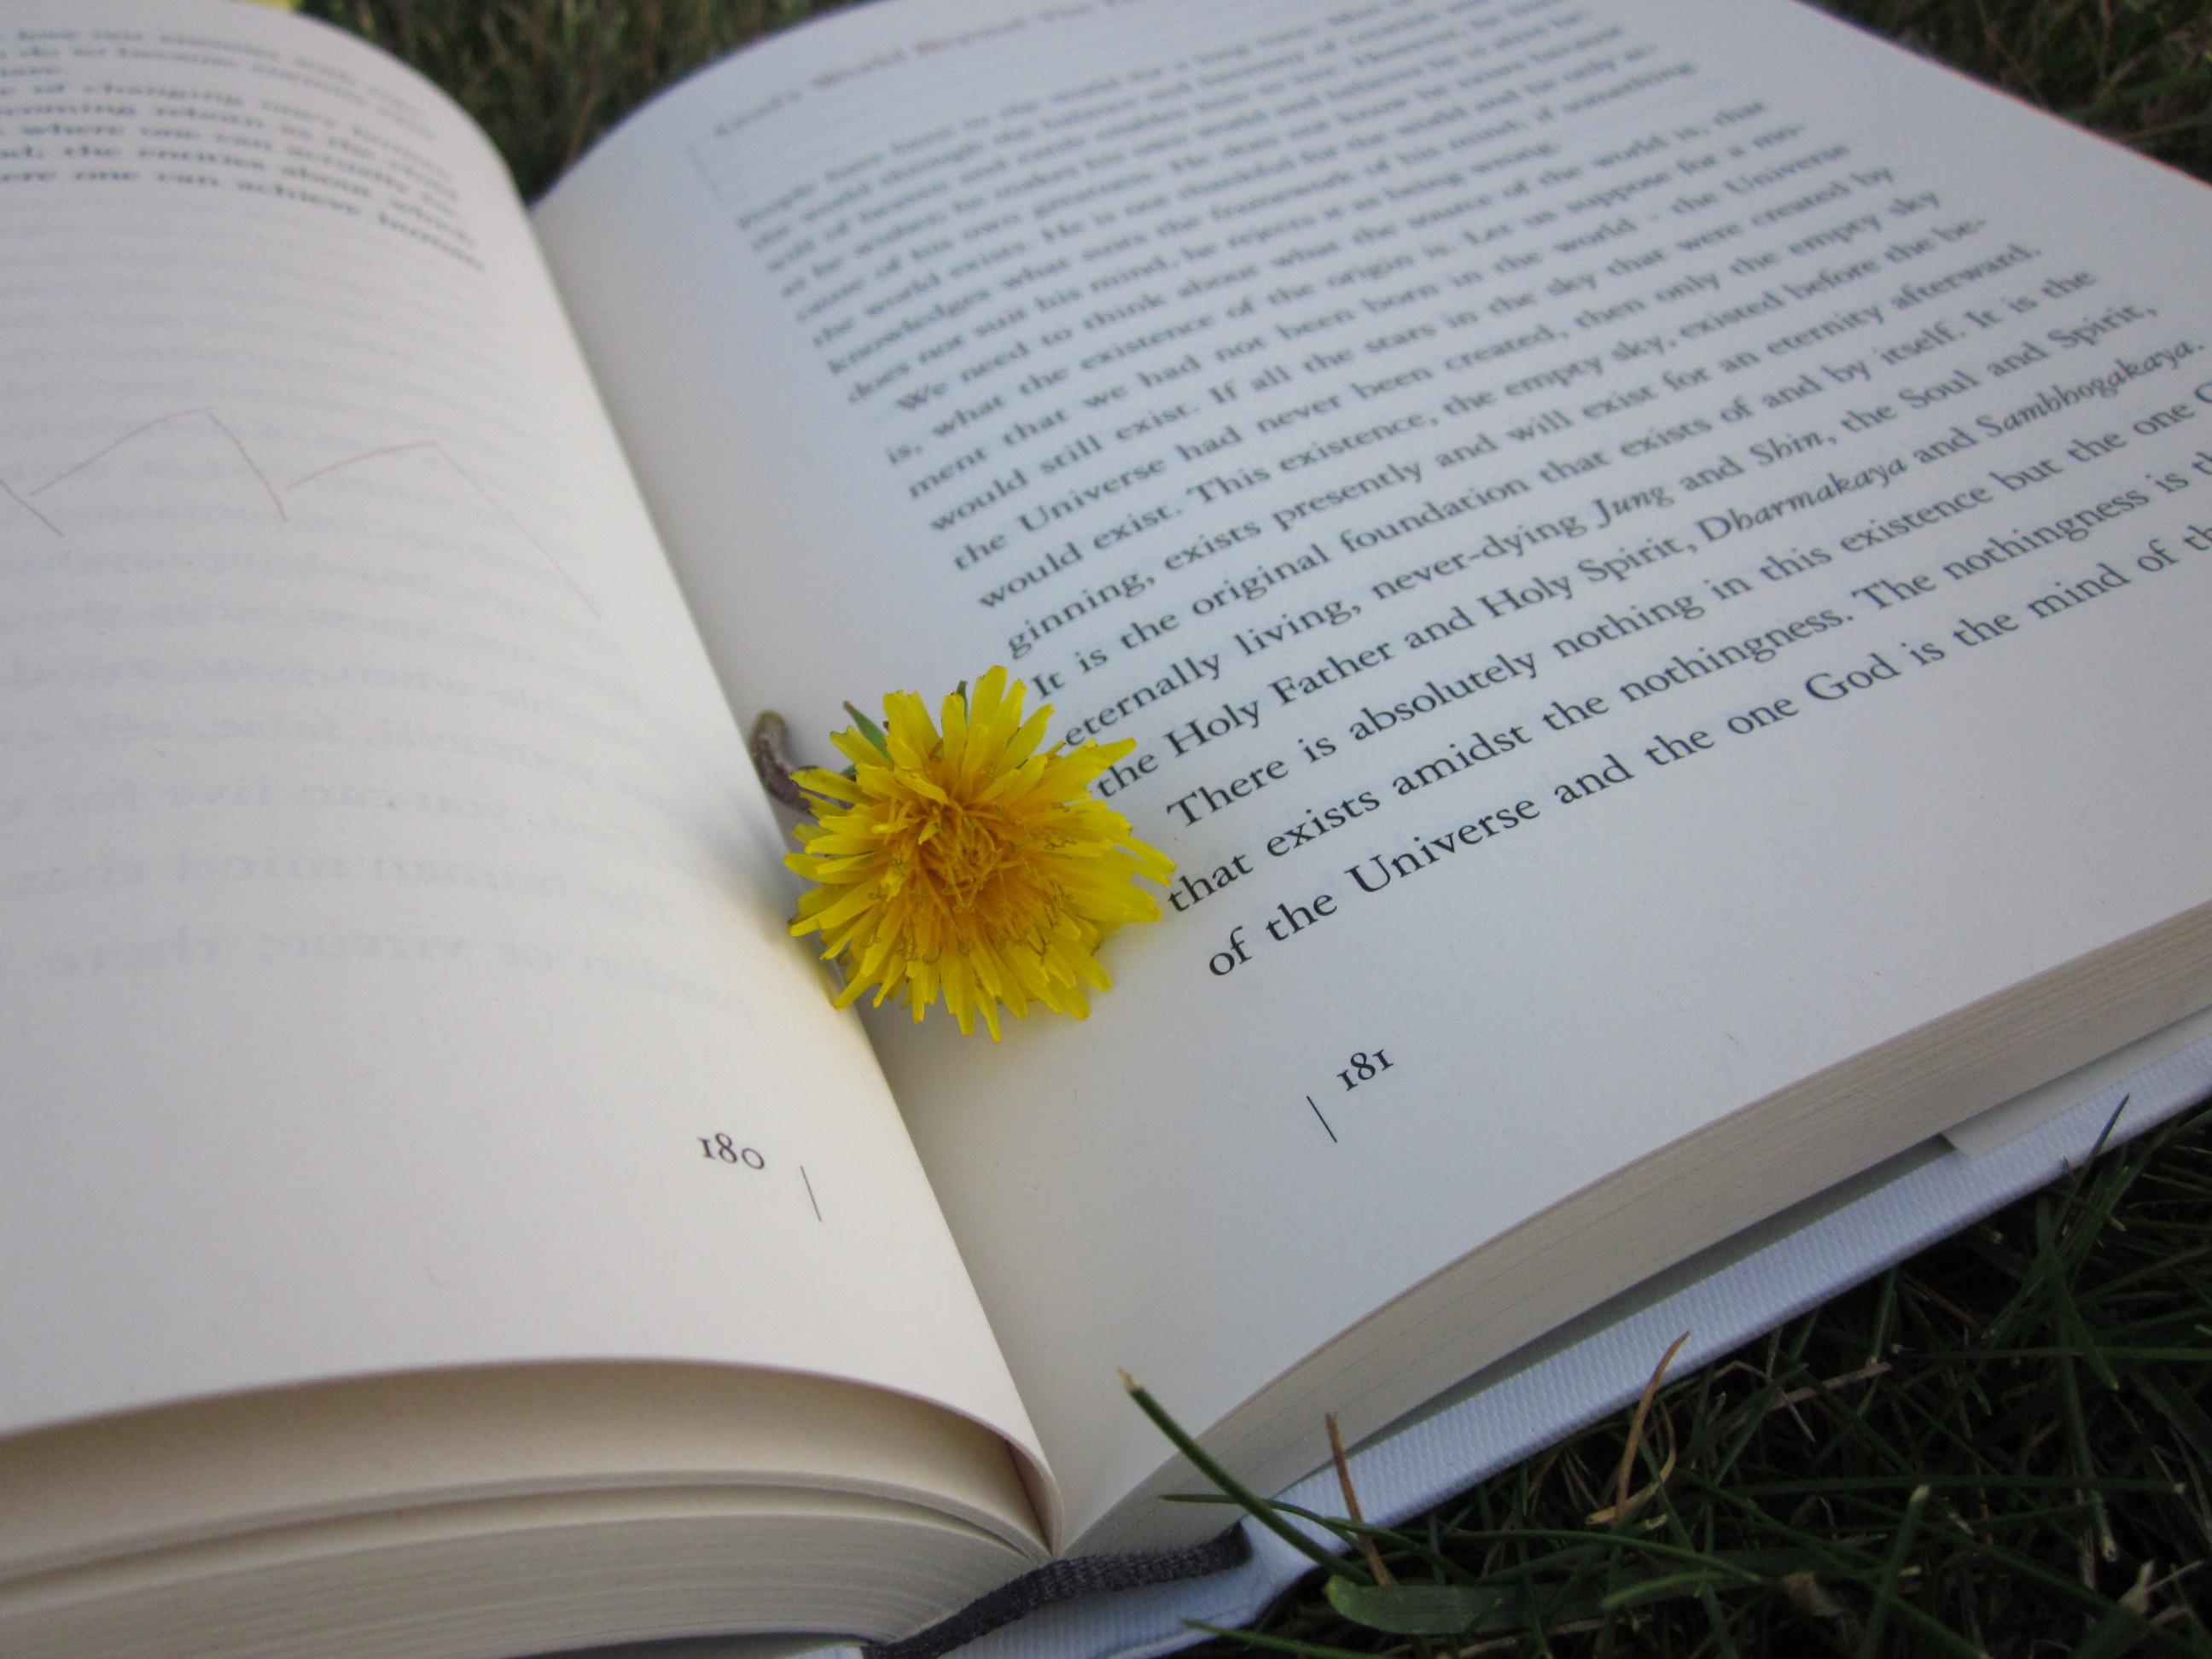 The Meaning Of Life - Wisdom's Webzine